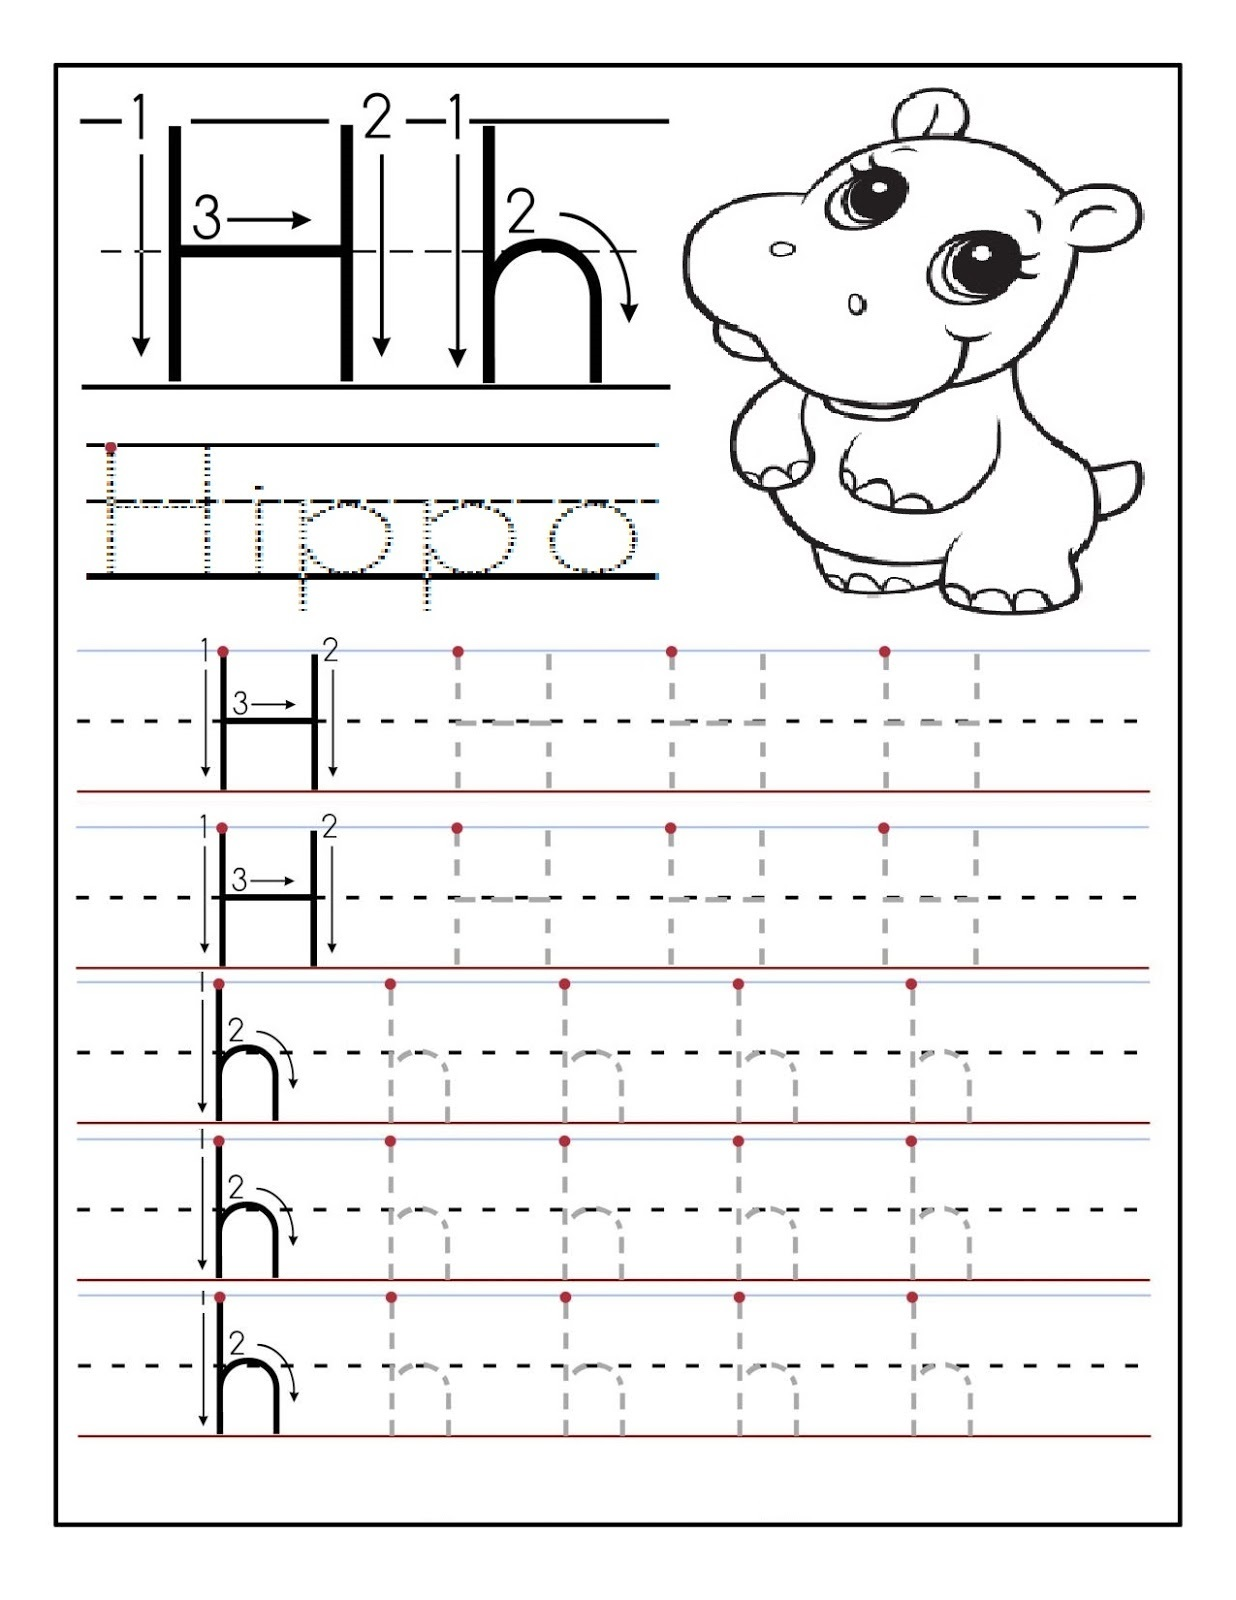 Printable Letter H Tracing Worksheets For Preschoolers, Alphabet